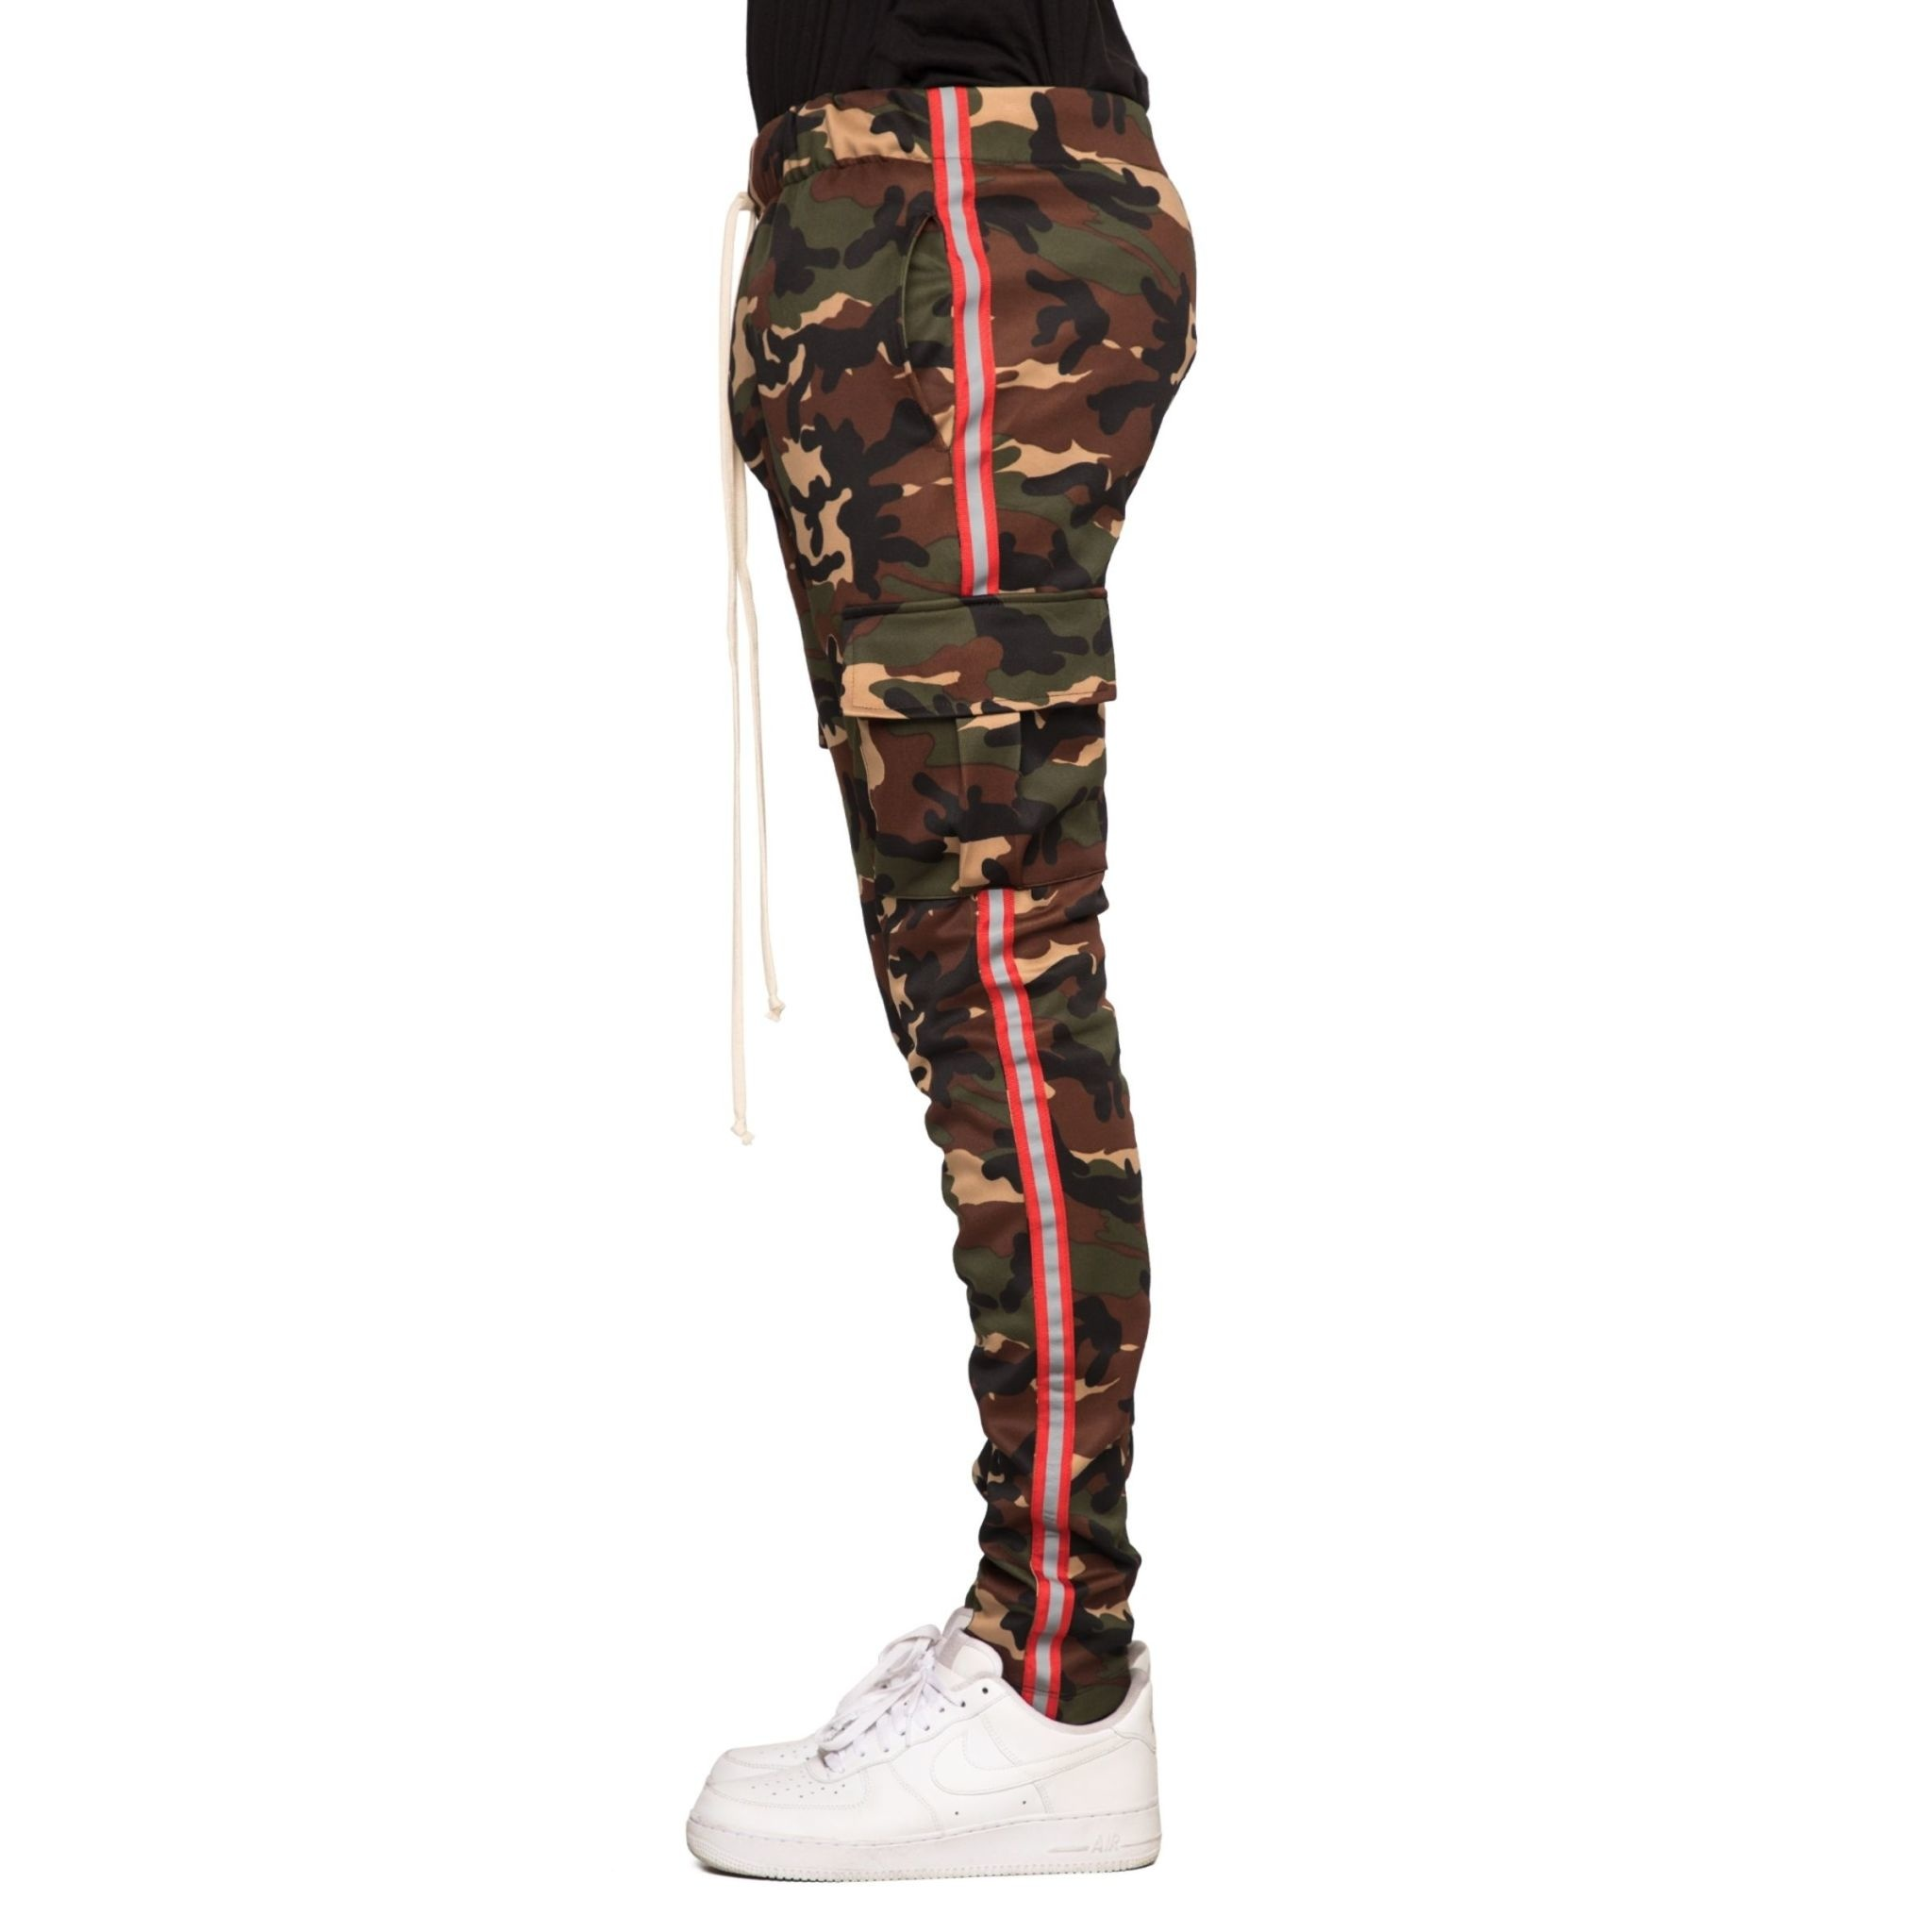 35a935a8346653 eptm reflective cargo track pants (camo) - OSO:a style lab